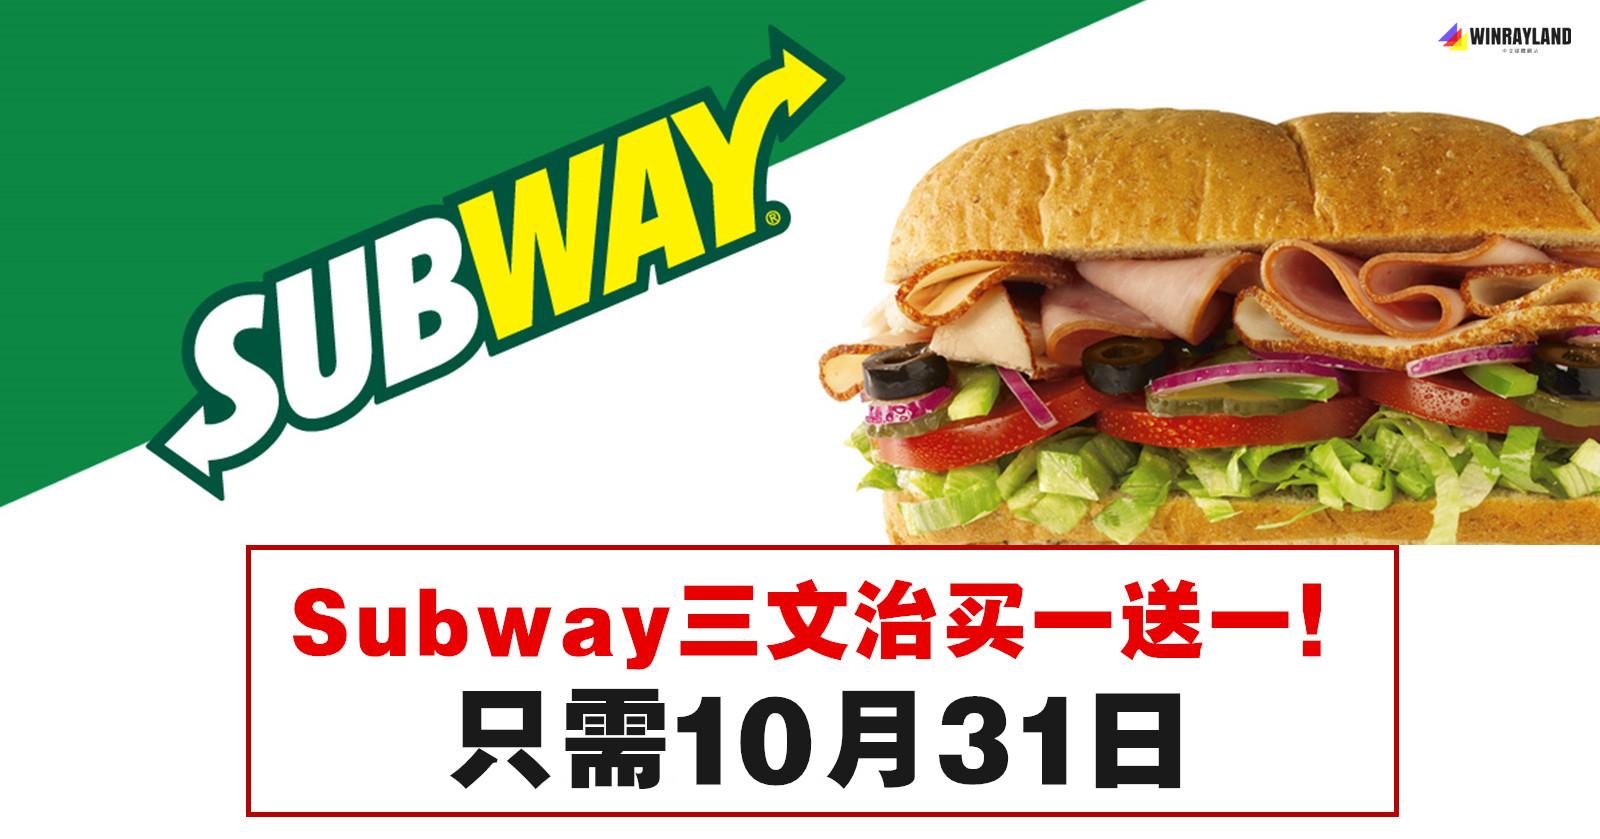 Subway 買一送一 - WINRAYLAND